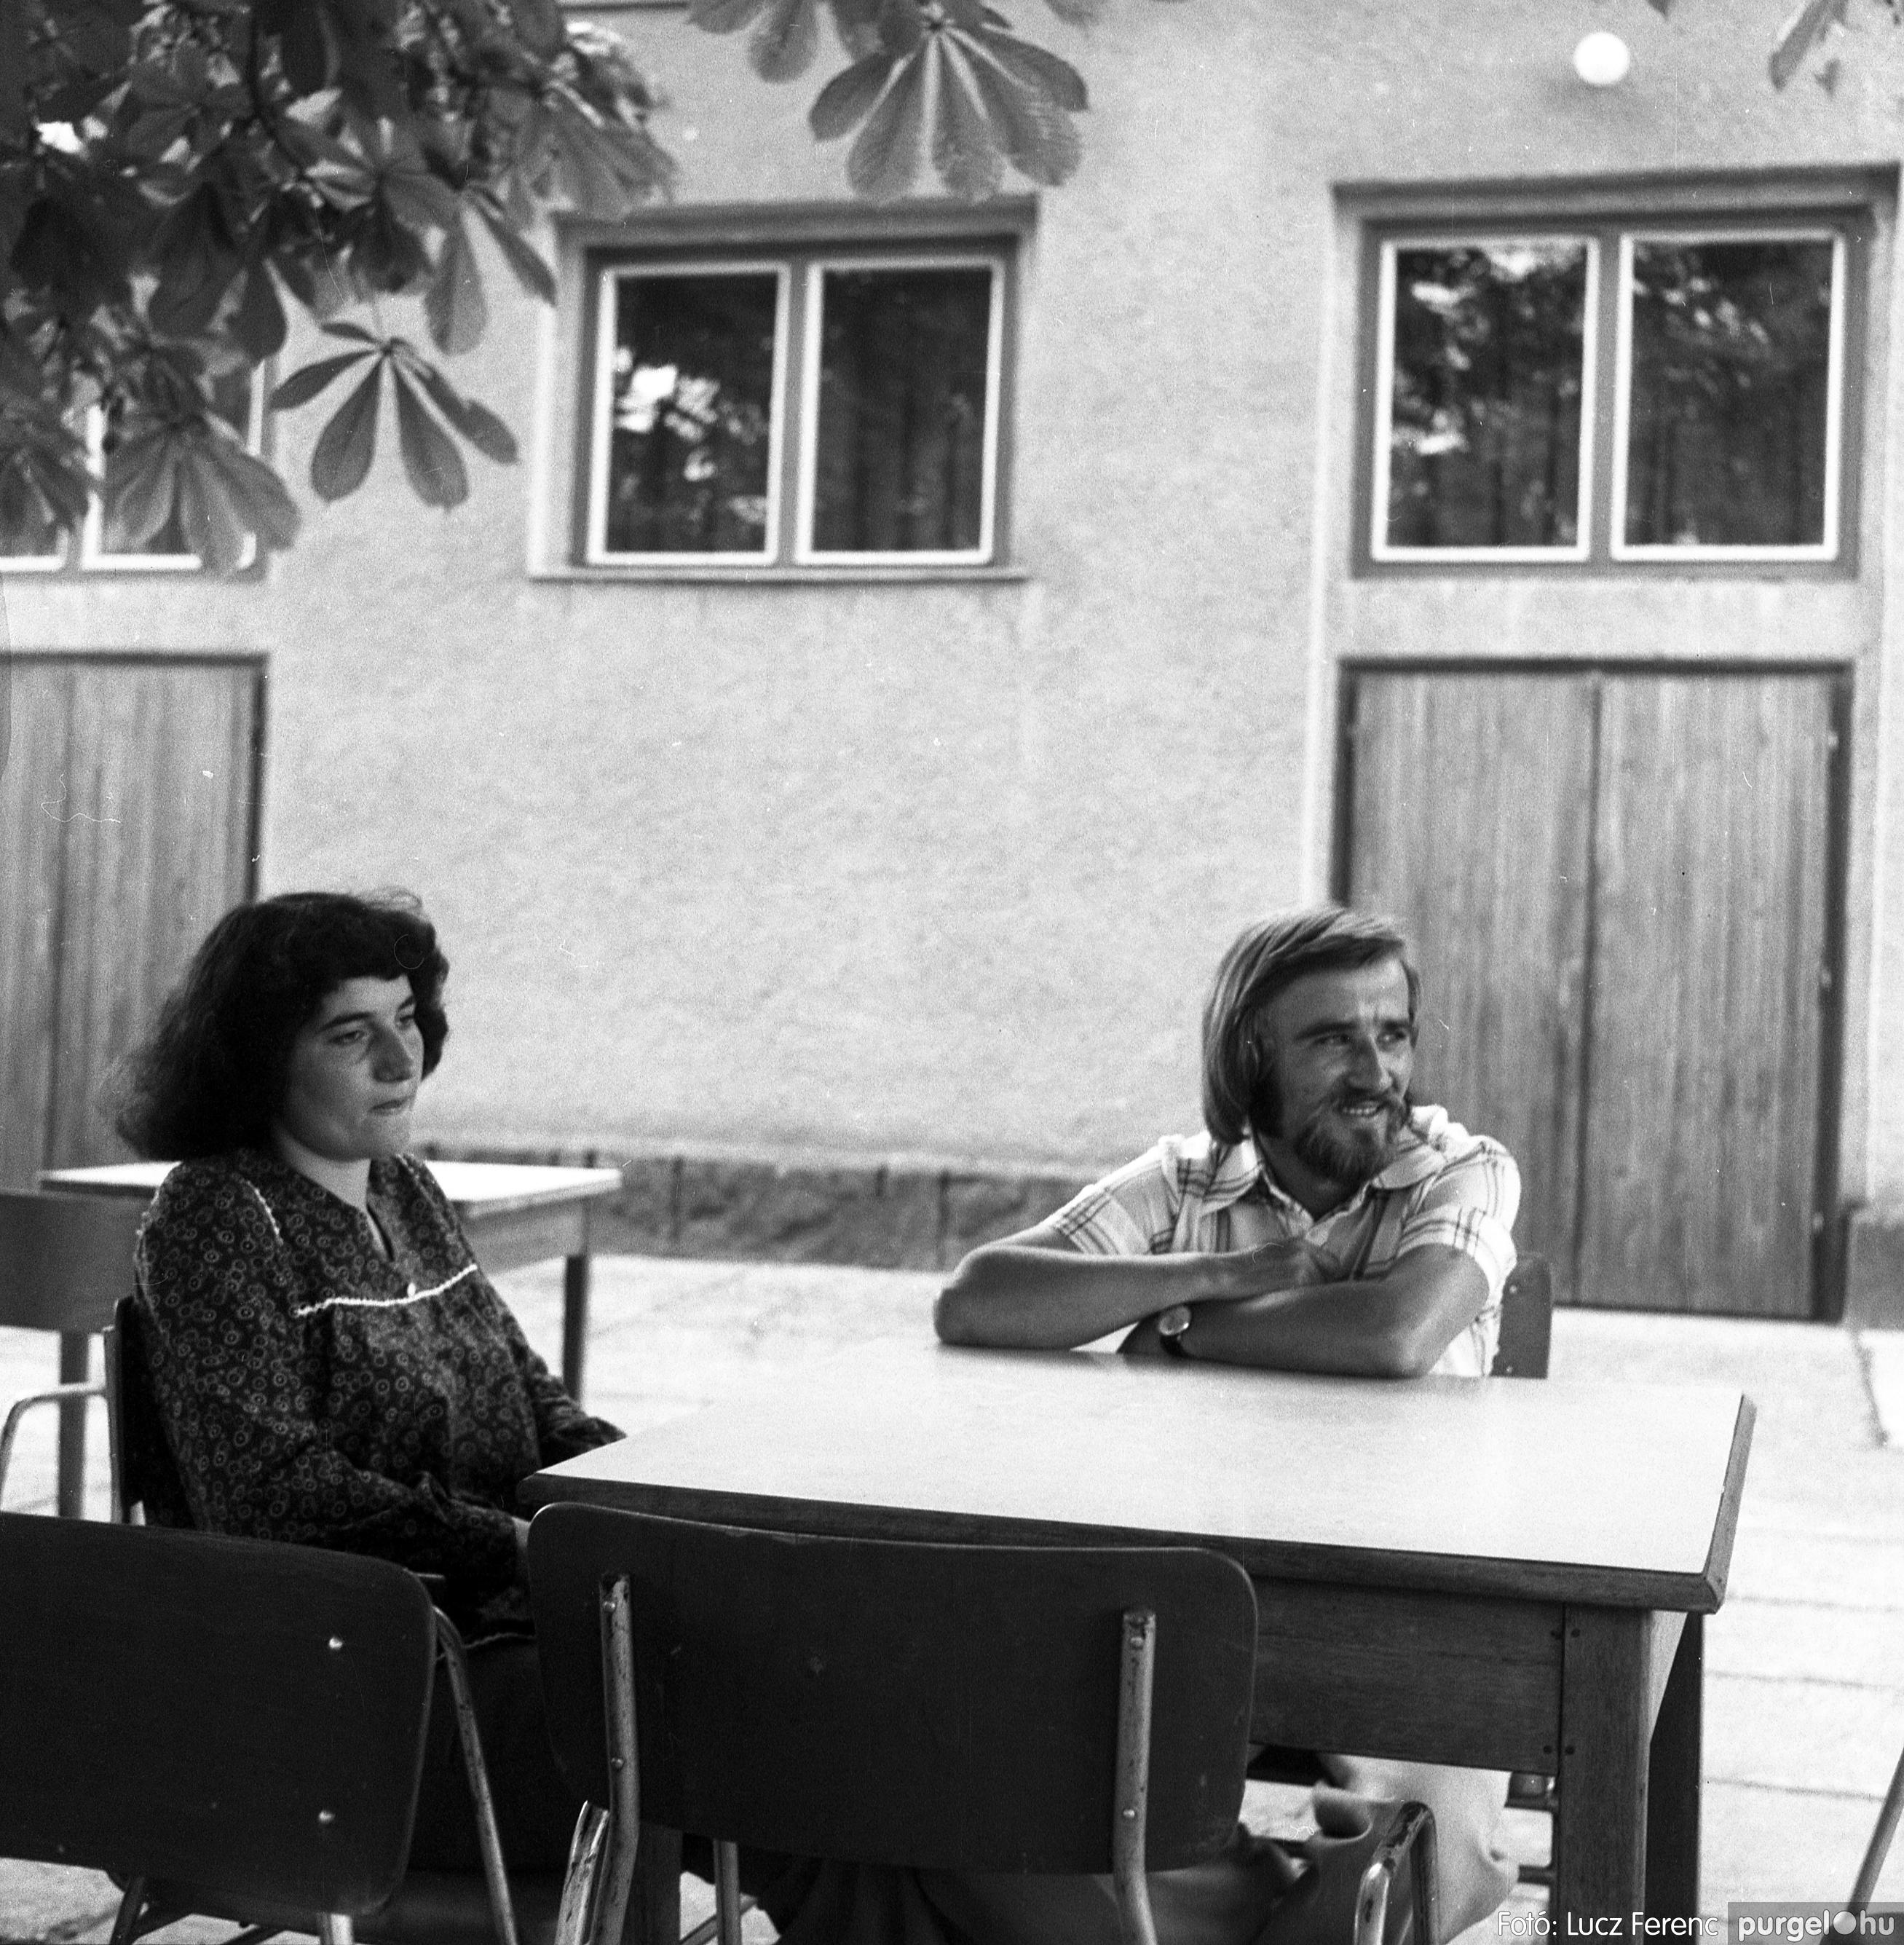 027. 1975. Buli a kultúrban 004. - Fotó: Lucz Ferenc.jpg